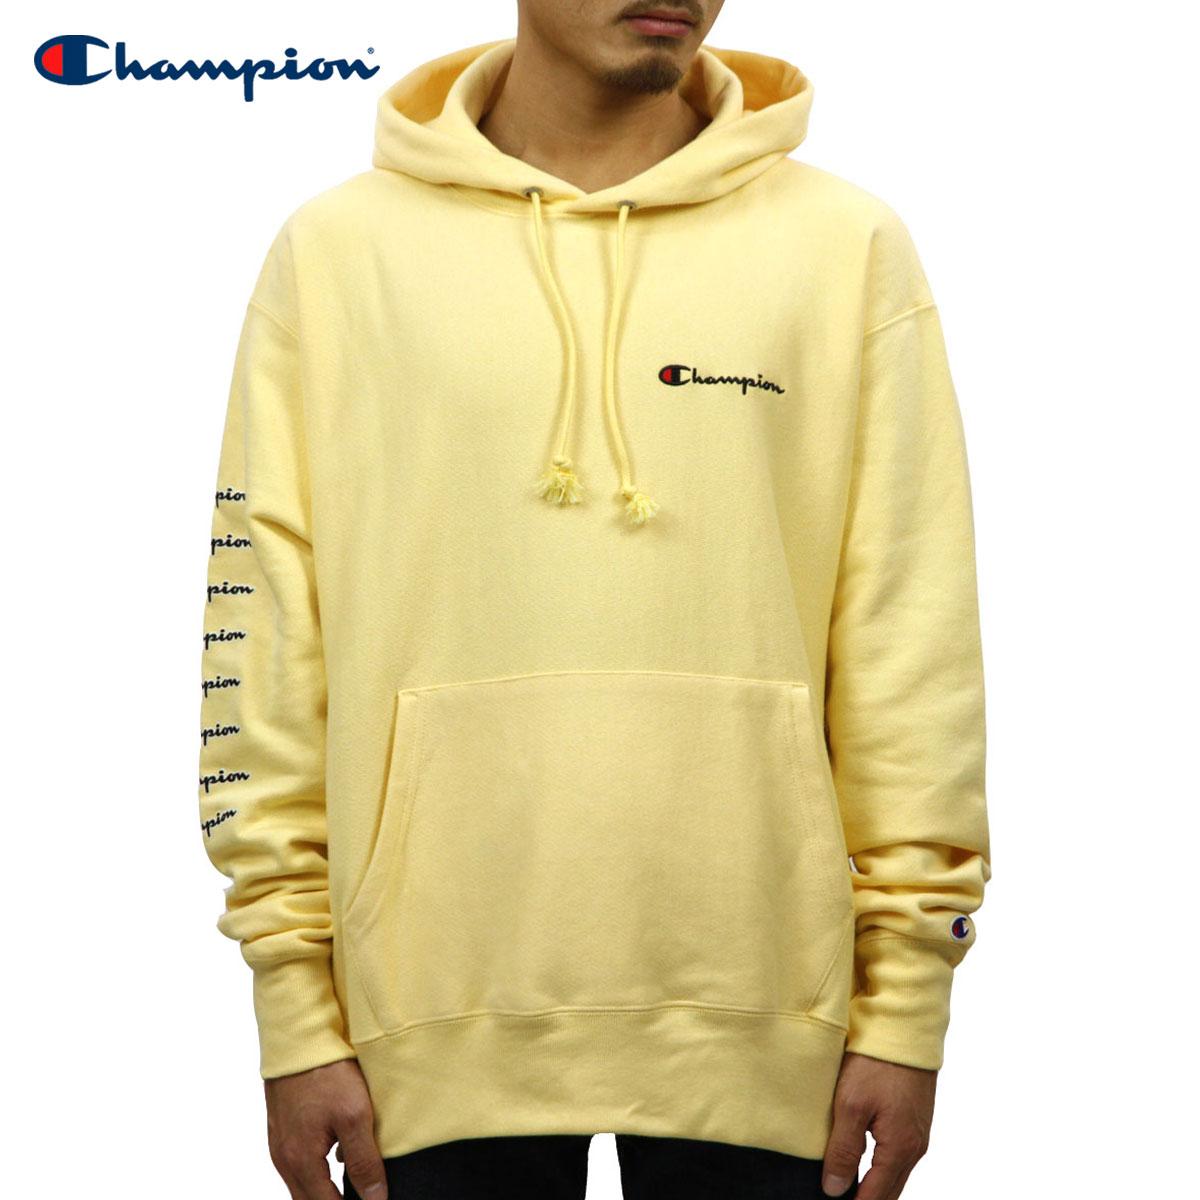 Champion Men/'s Graphic Pullover Hoodie Yellow